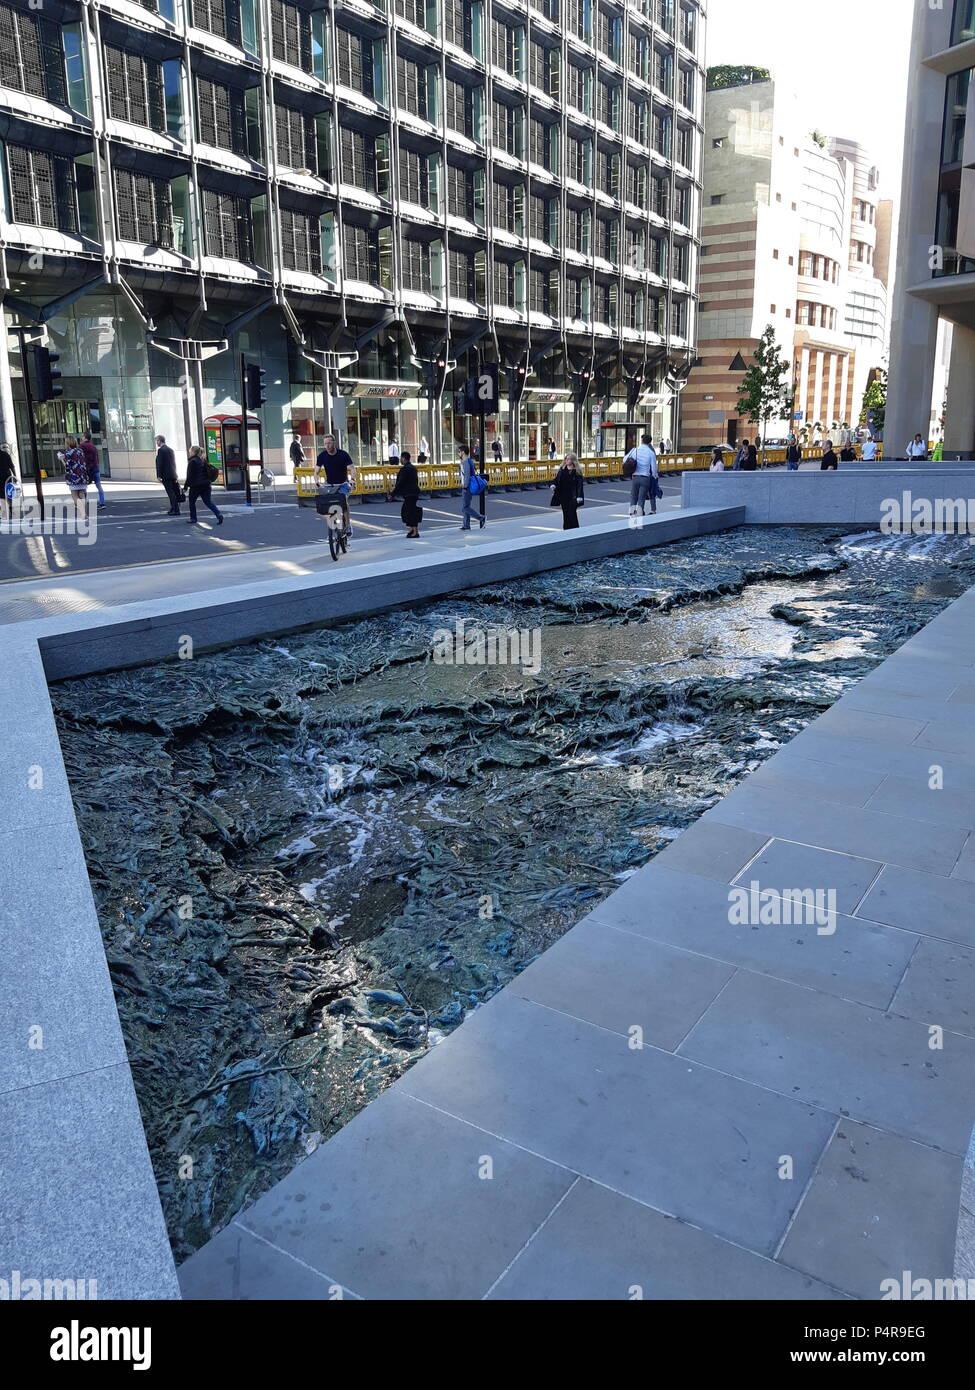 'Forgotten Streams': public artwork by Spanish artist Cristina Iglesias at Bloomberg's new European Headquarters, City of London, UK, PETER GRANT - Stock Image